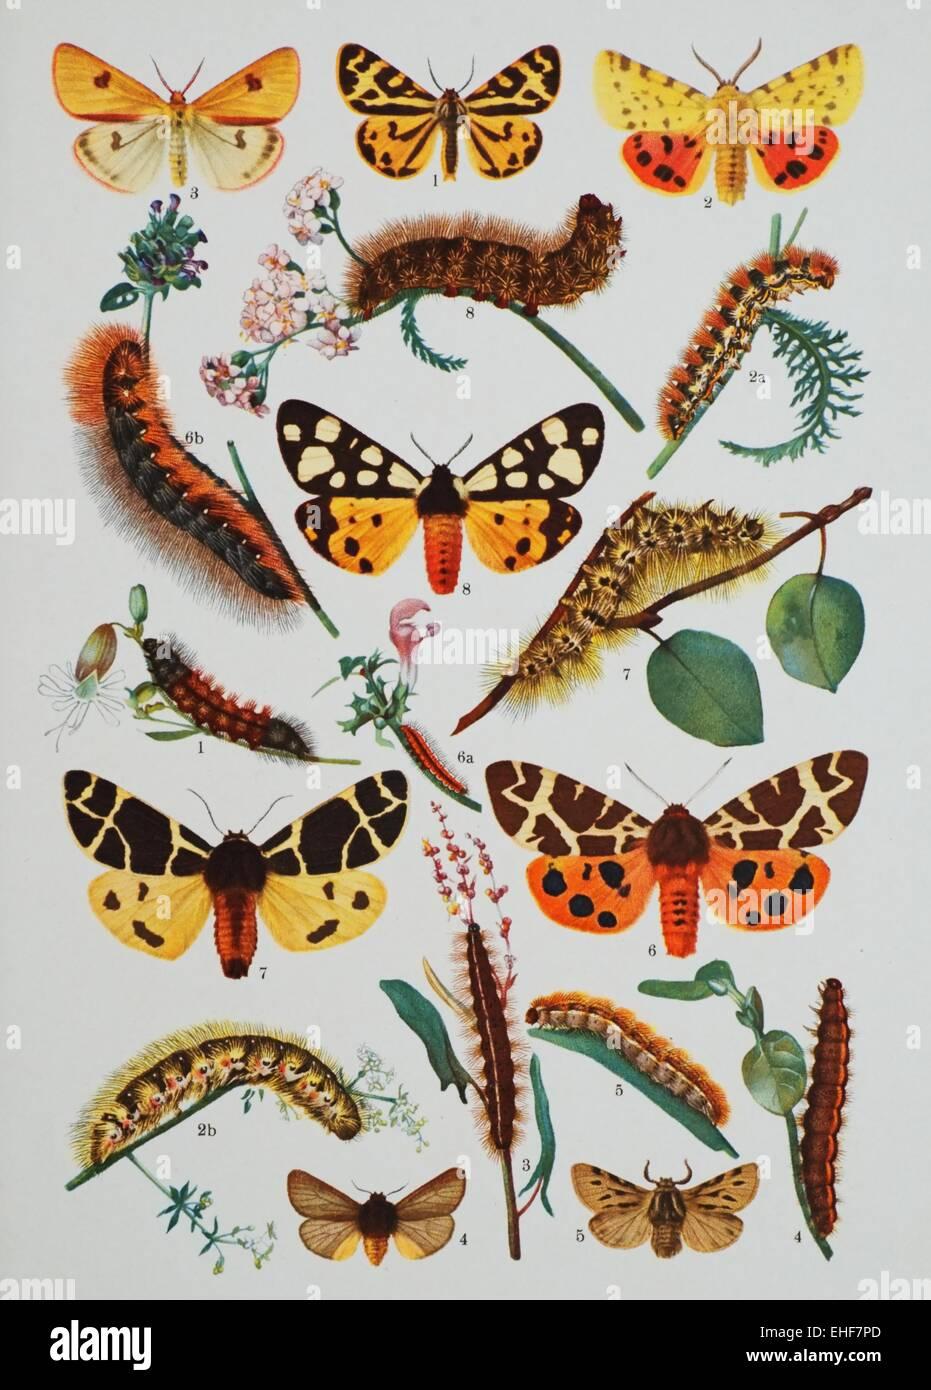 Butterfly scientific illustration